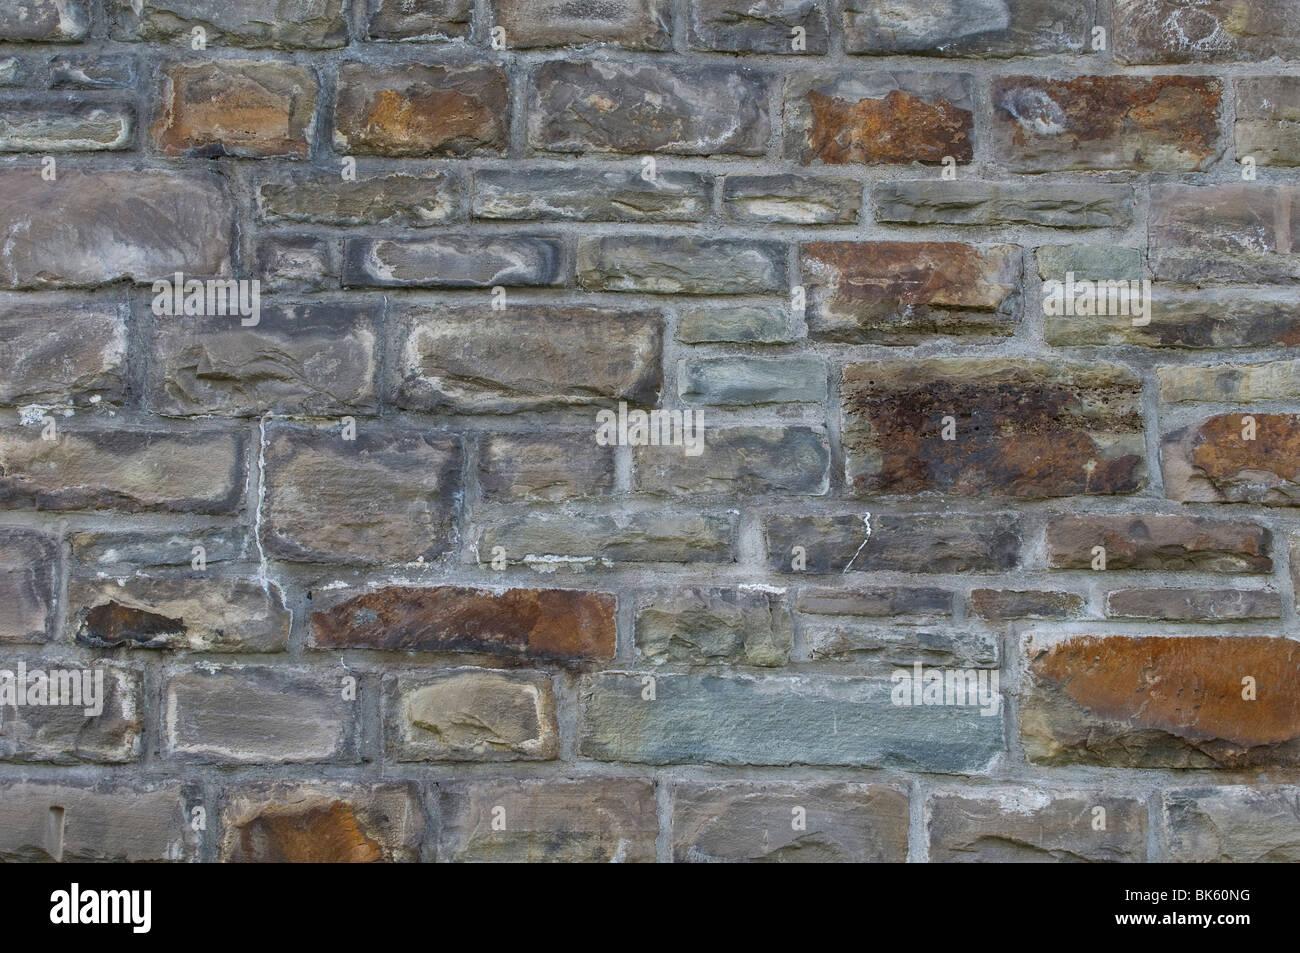 Stone wall, full frame, background - Stock Image